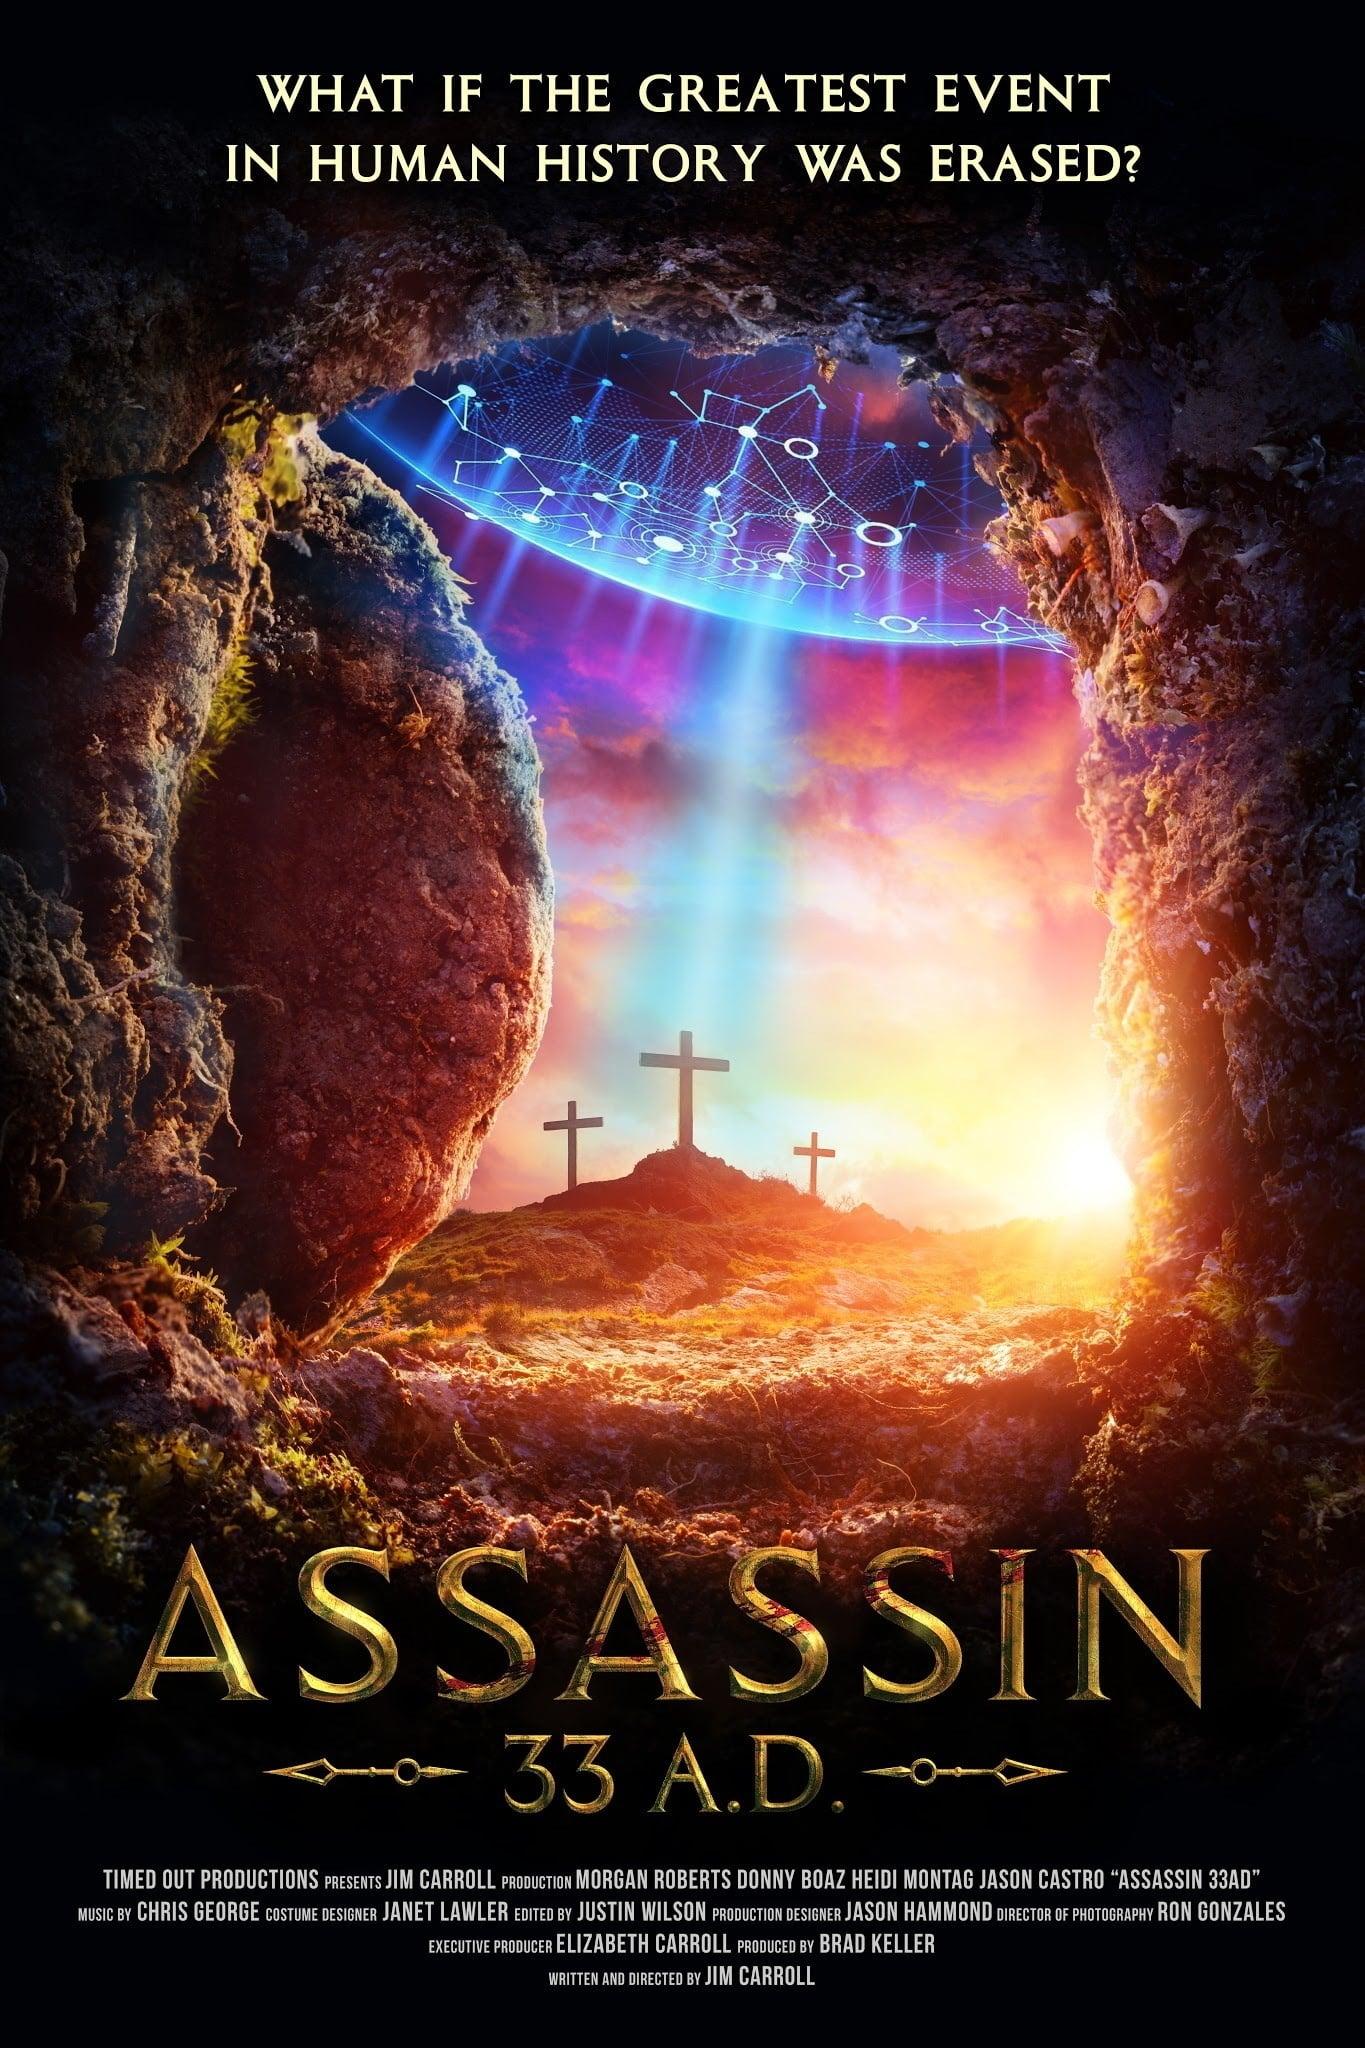 Assassin 33 A.D. poster